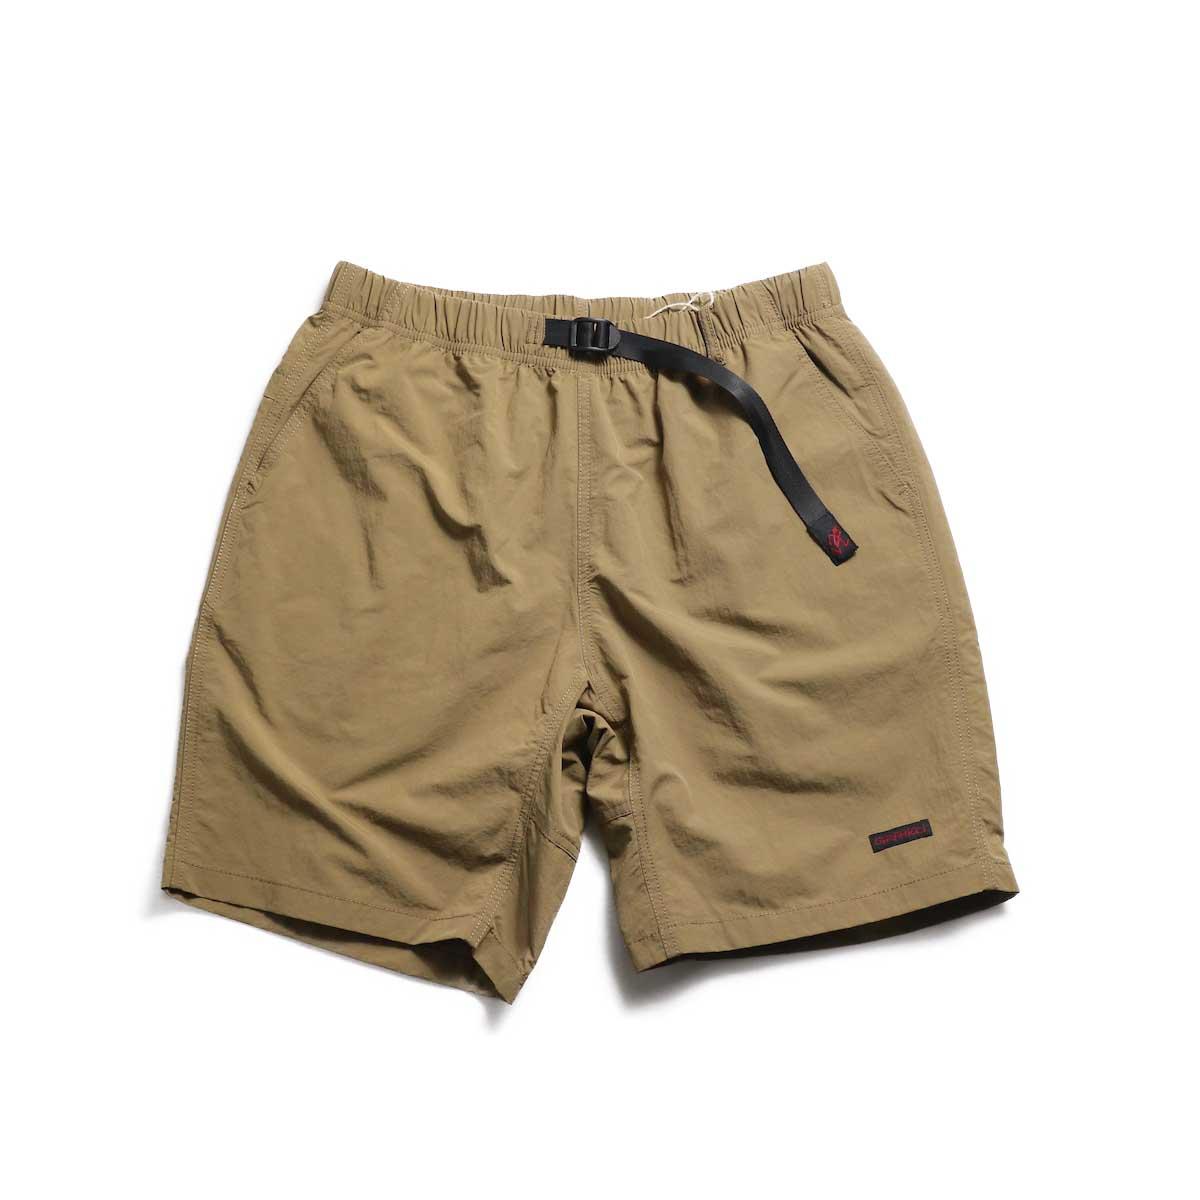 GRAMICCI / Shell Packable Shorts -Tan